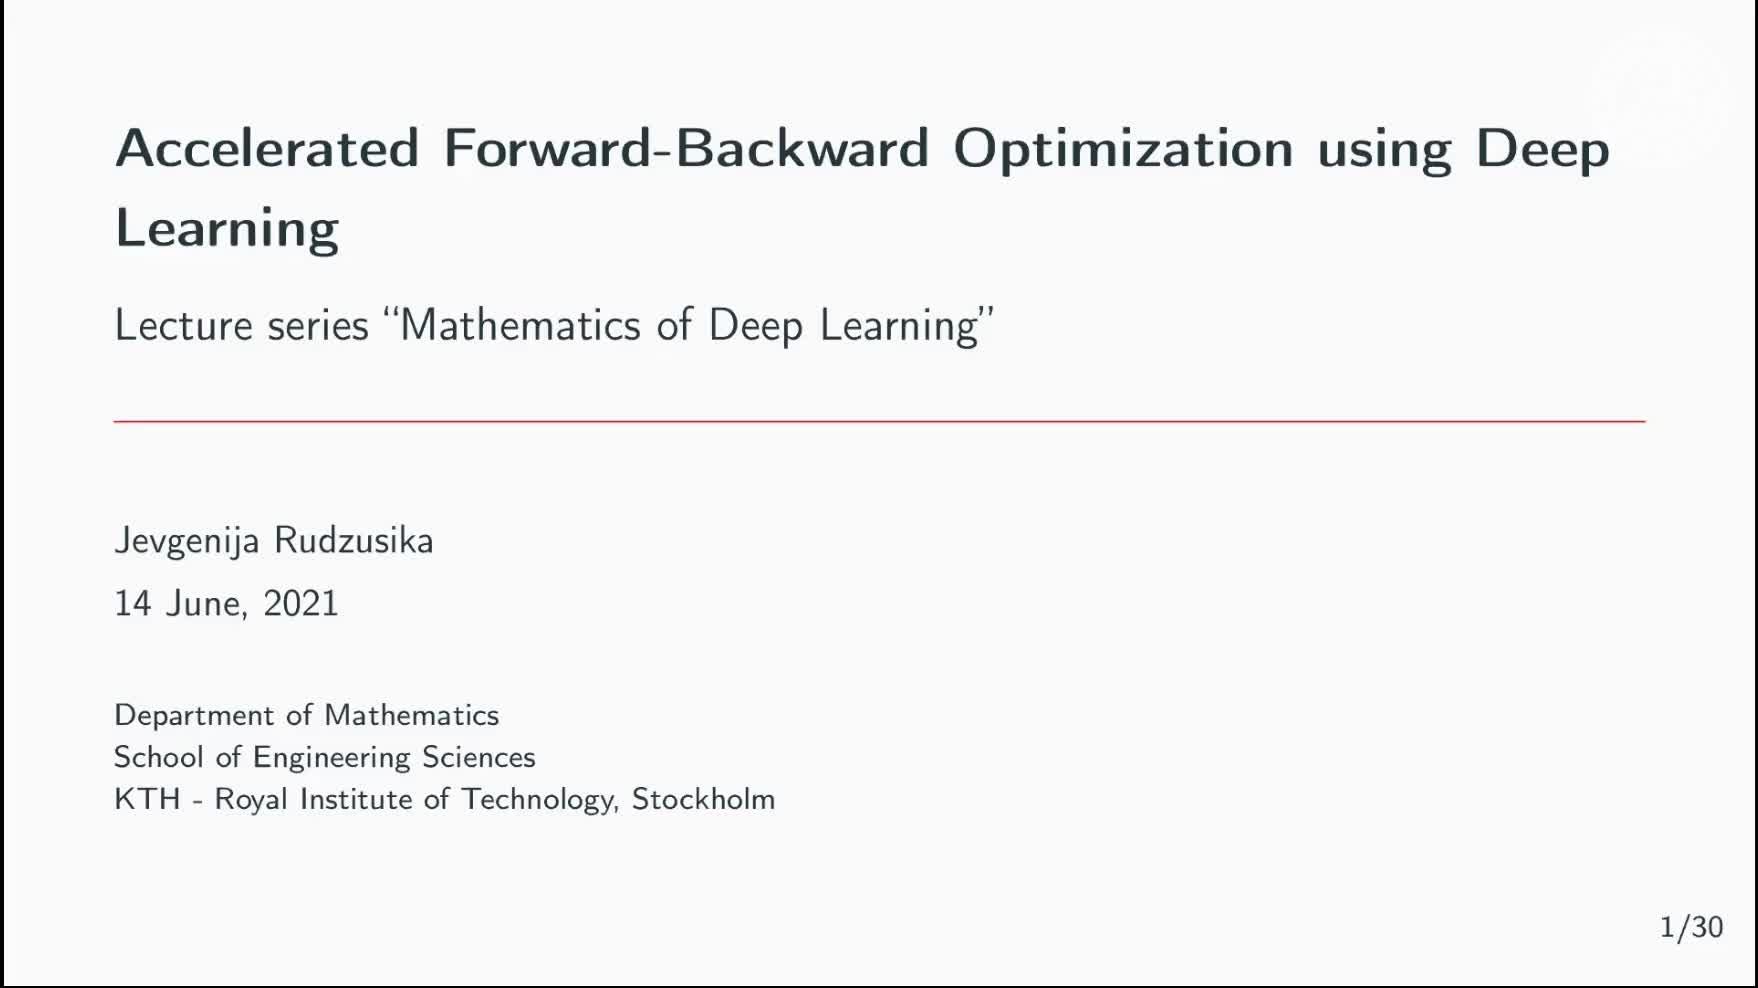 Accelerated Forward-Backward Optimization using Deep Learning preview image